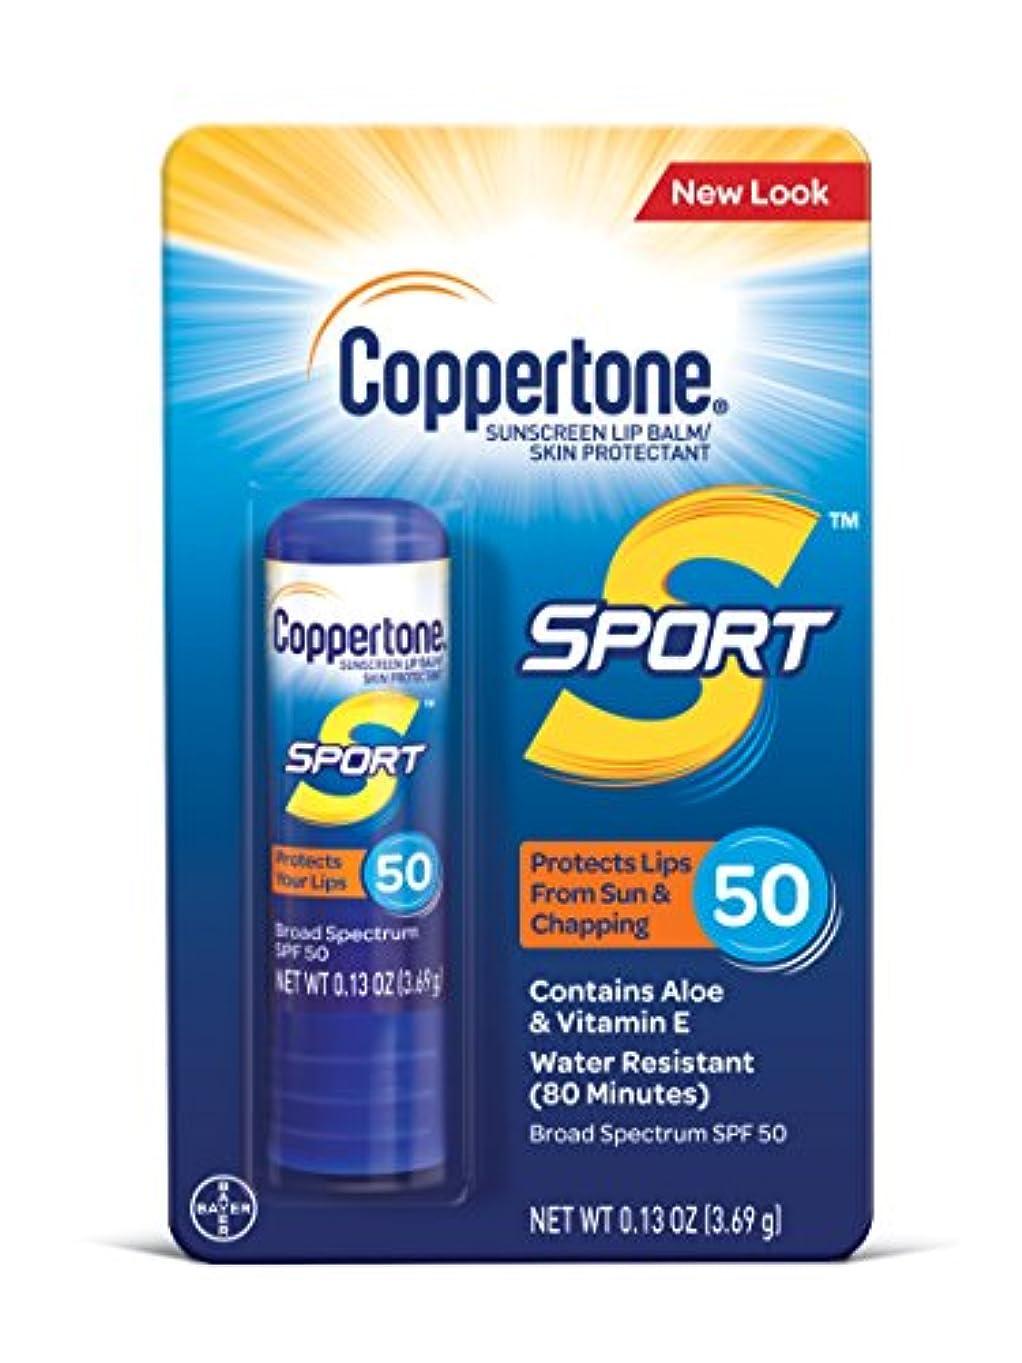 Coppertone スポーツ日焼け止めリップ広域スペクトルSPF 50.13液量オンス